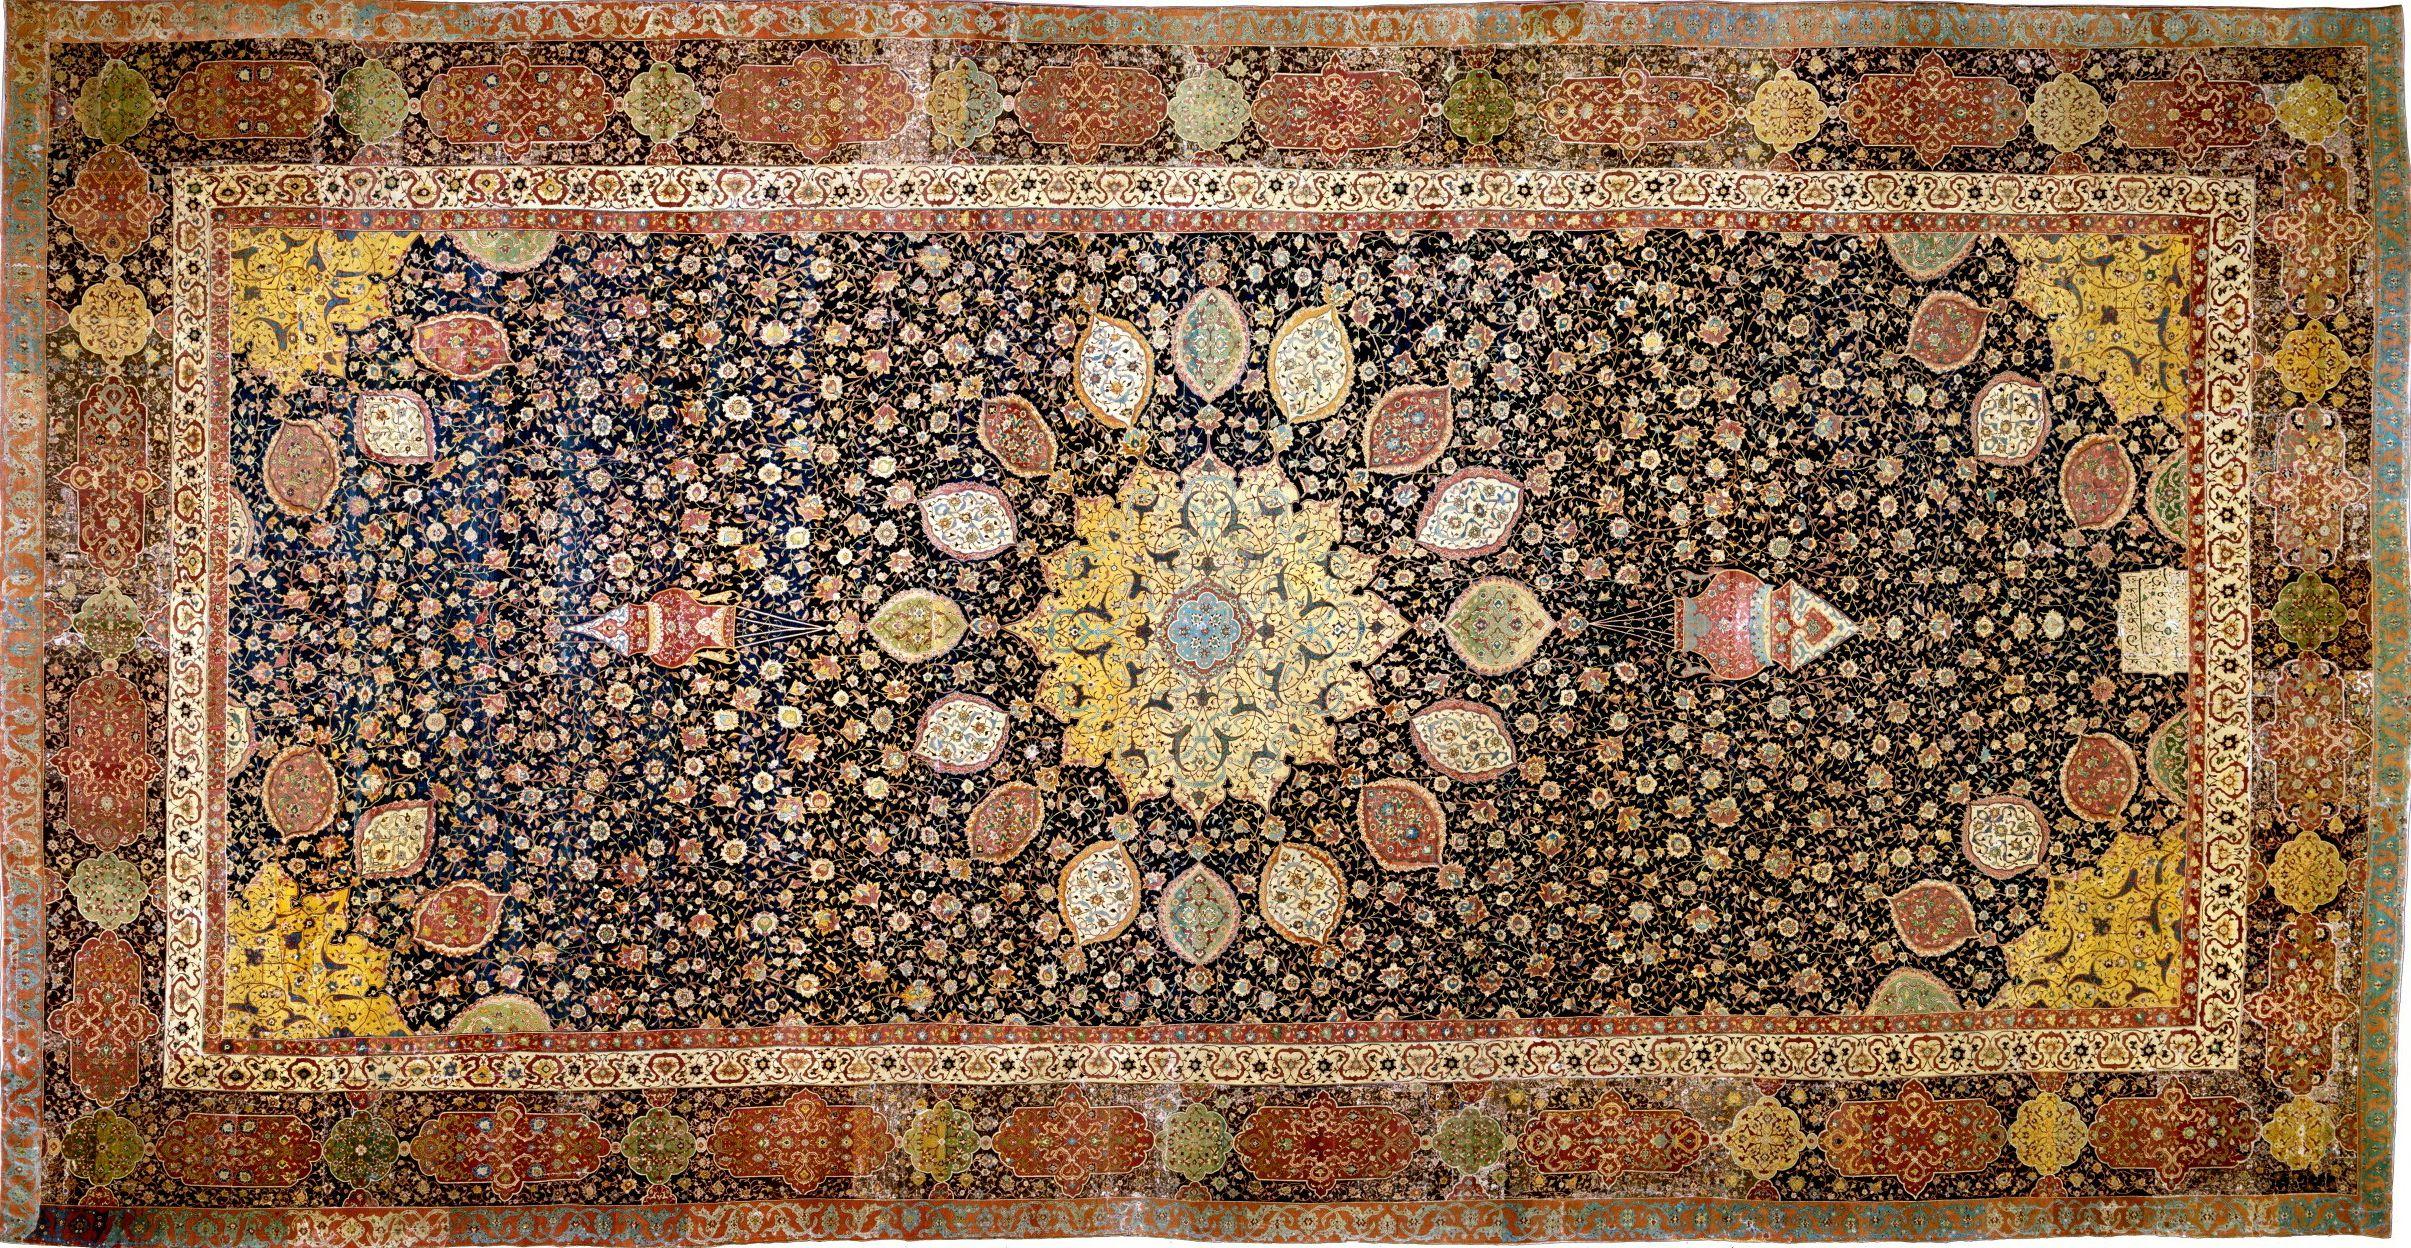 Ardabil Carpet Rotate Tabriz Rug Wikipedia Tabriz Rug Ap Art History 250 Carpet